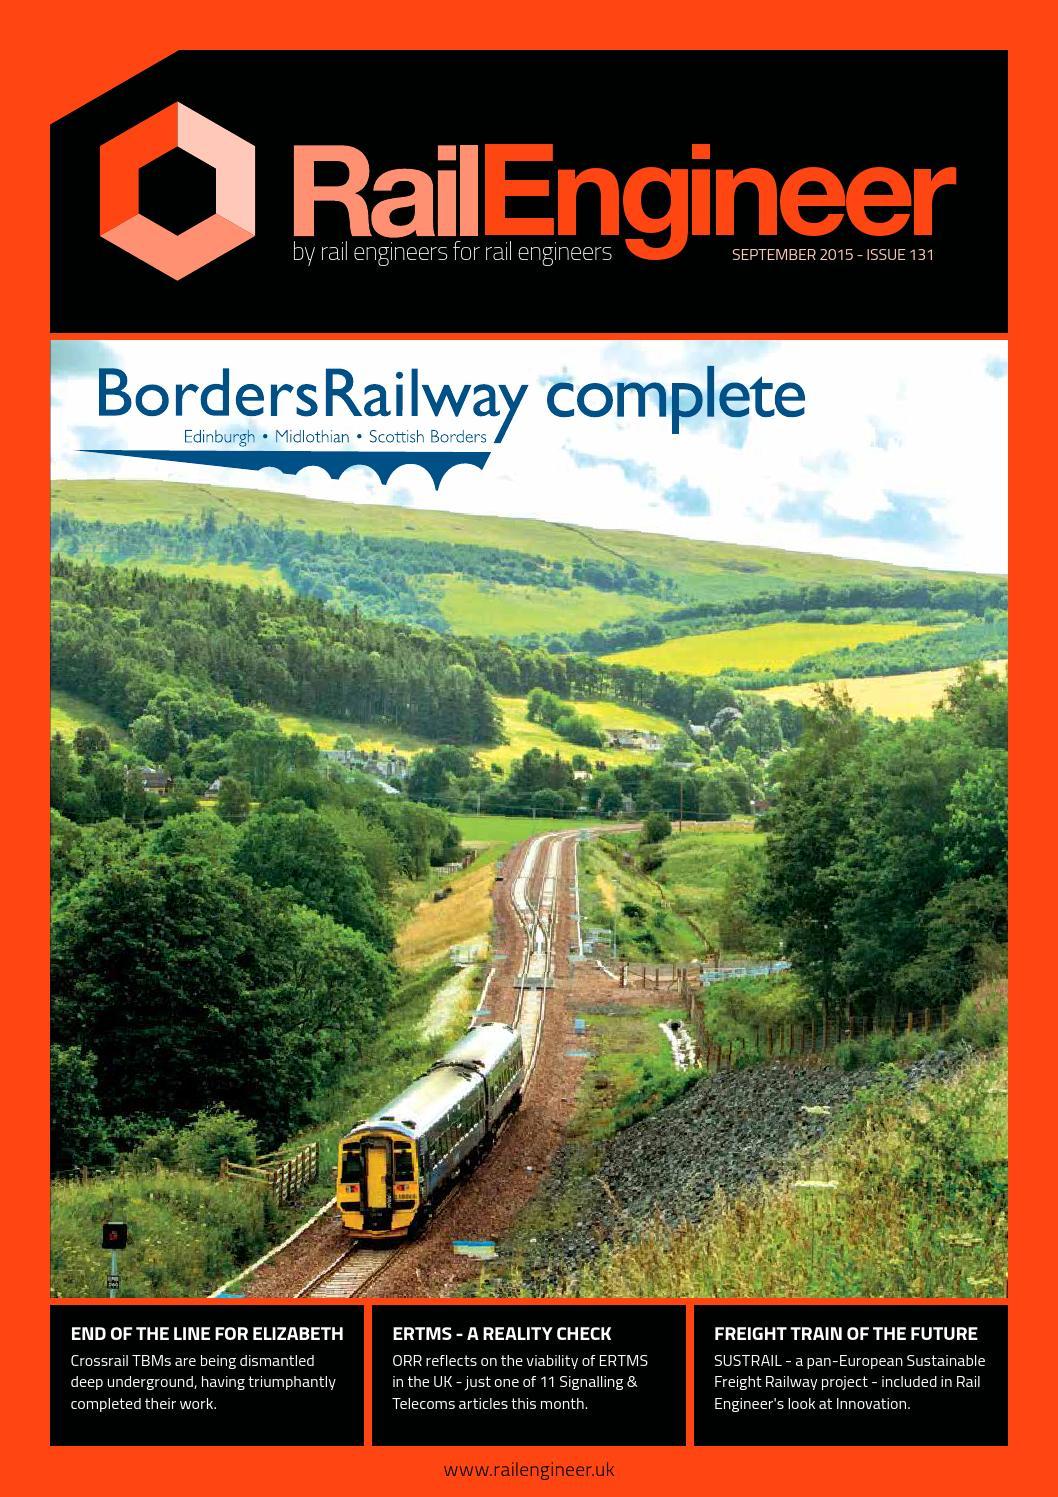 76f1eaa054 Rail Engineer - Issue 131 - September 2015 by Rail Media - issuu